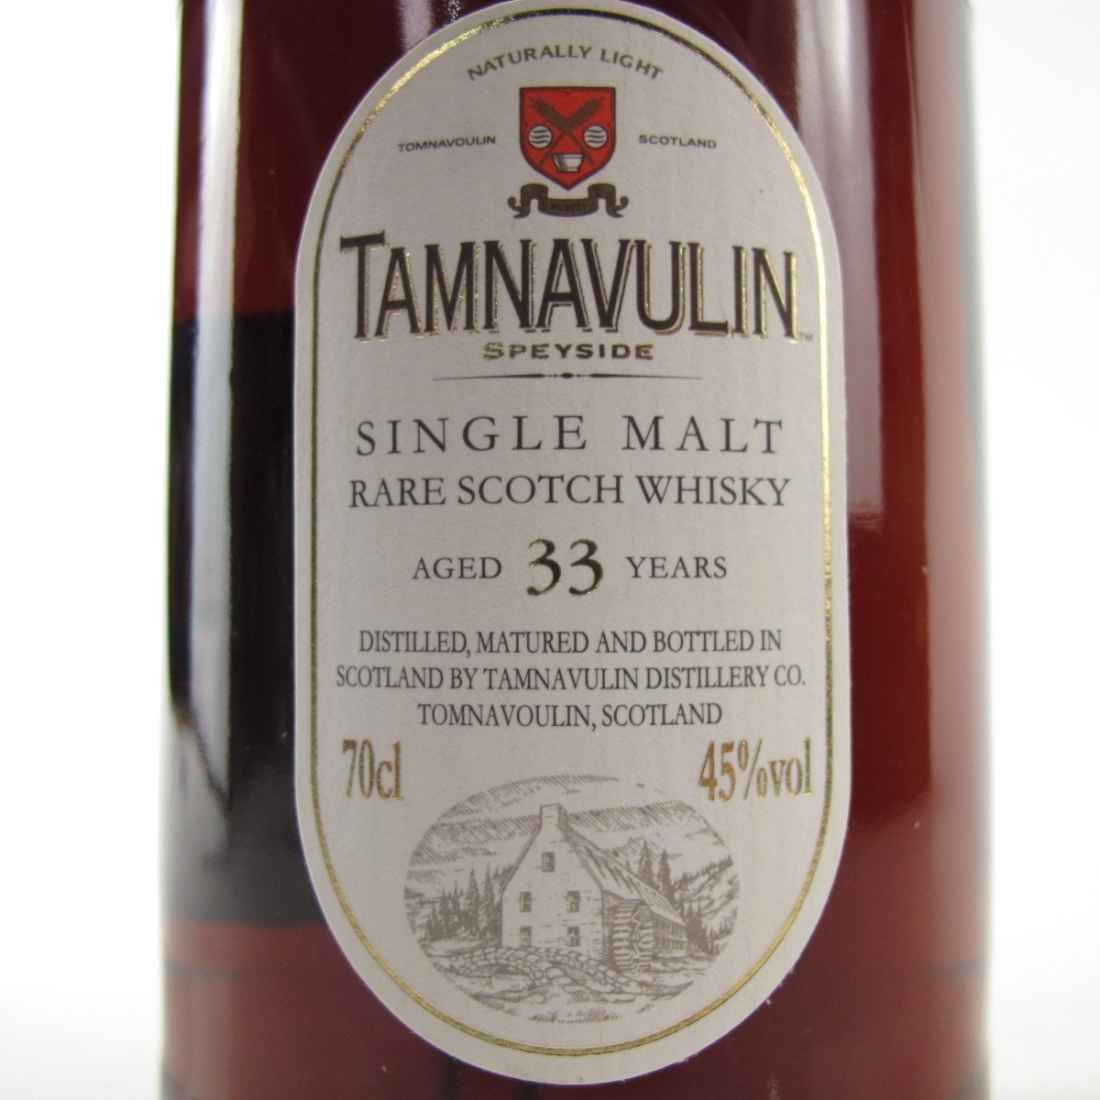 Tamnavulin 33 Year Old Stillman's Dram